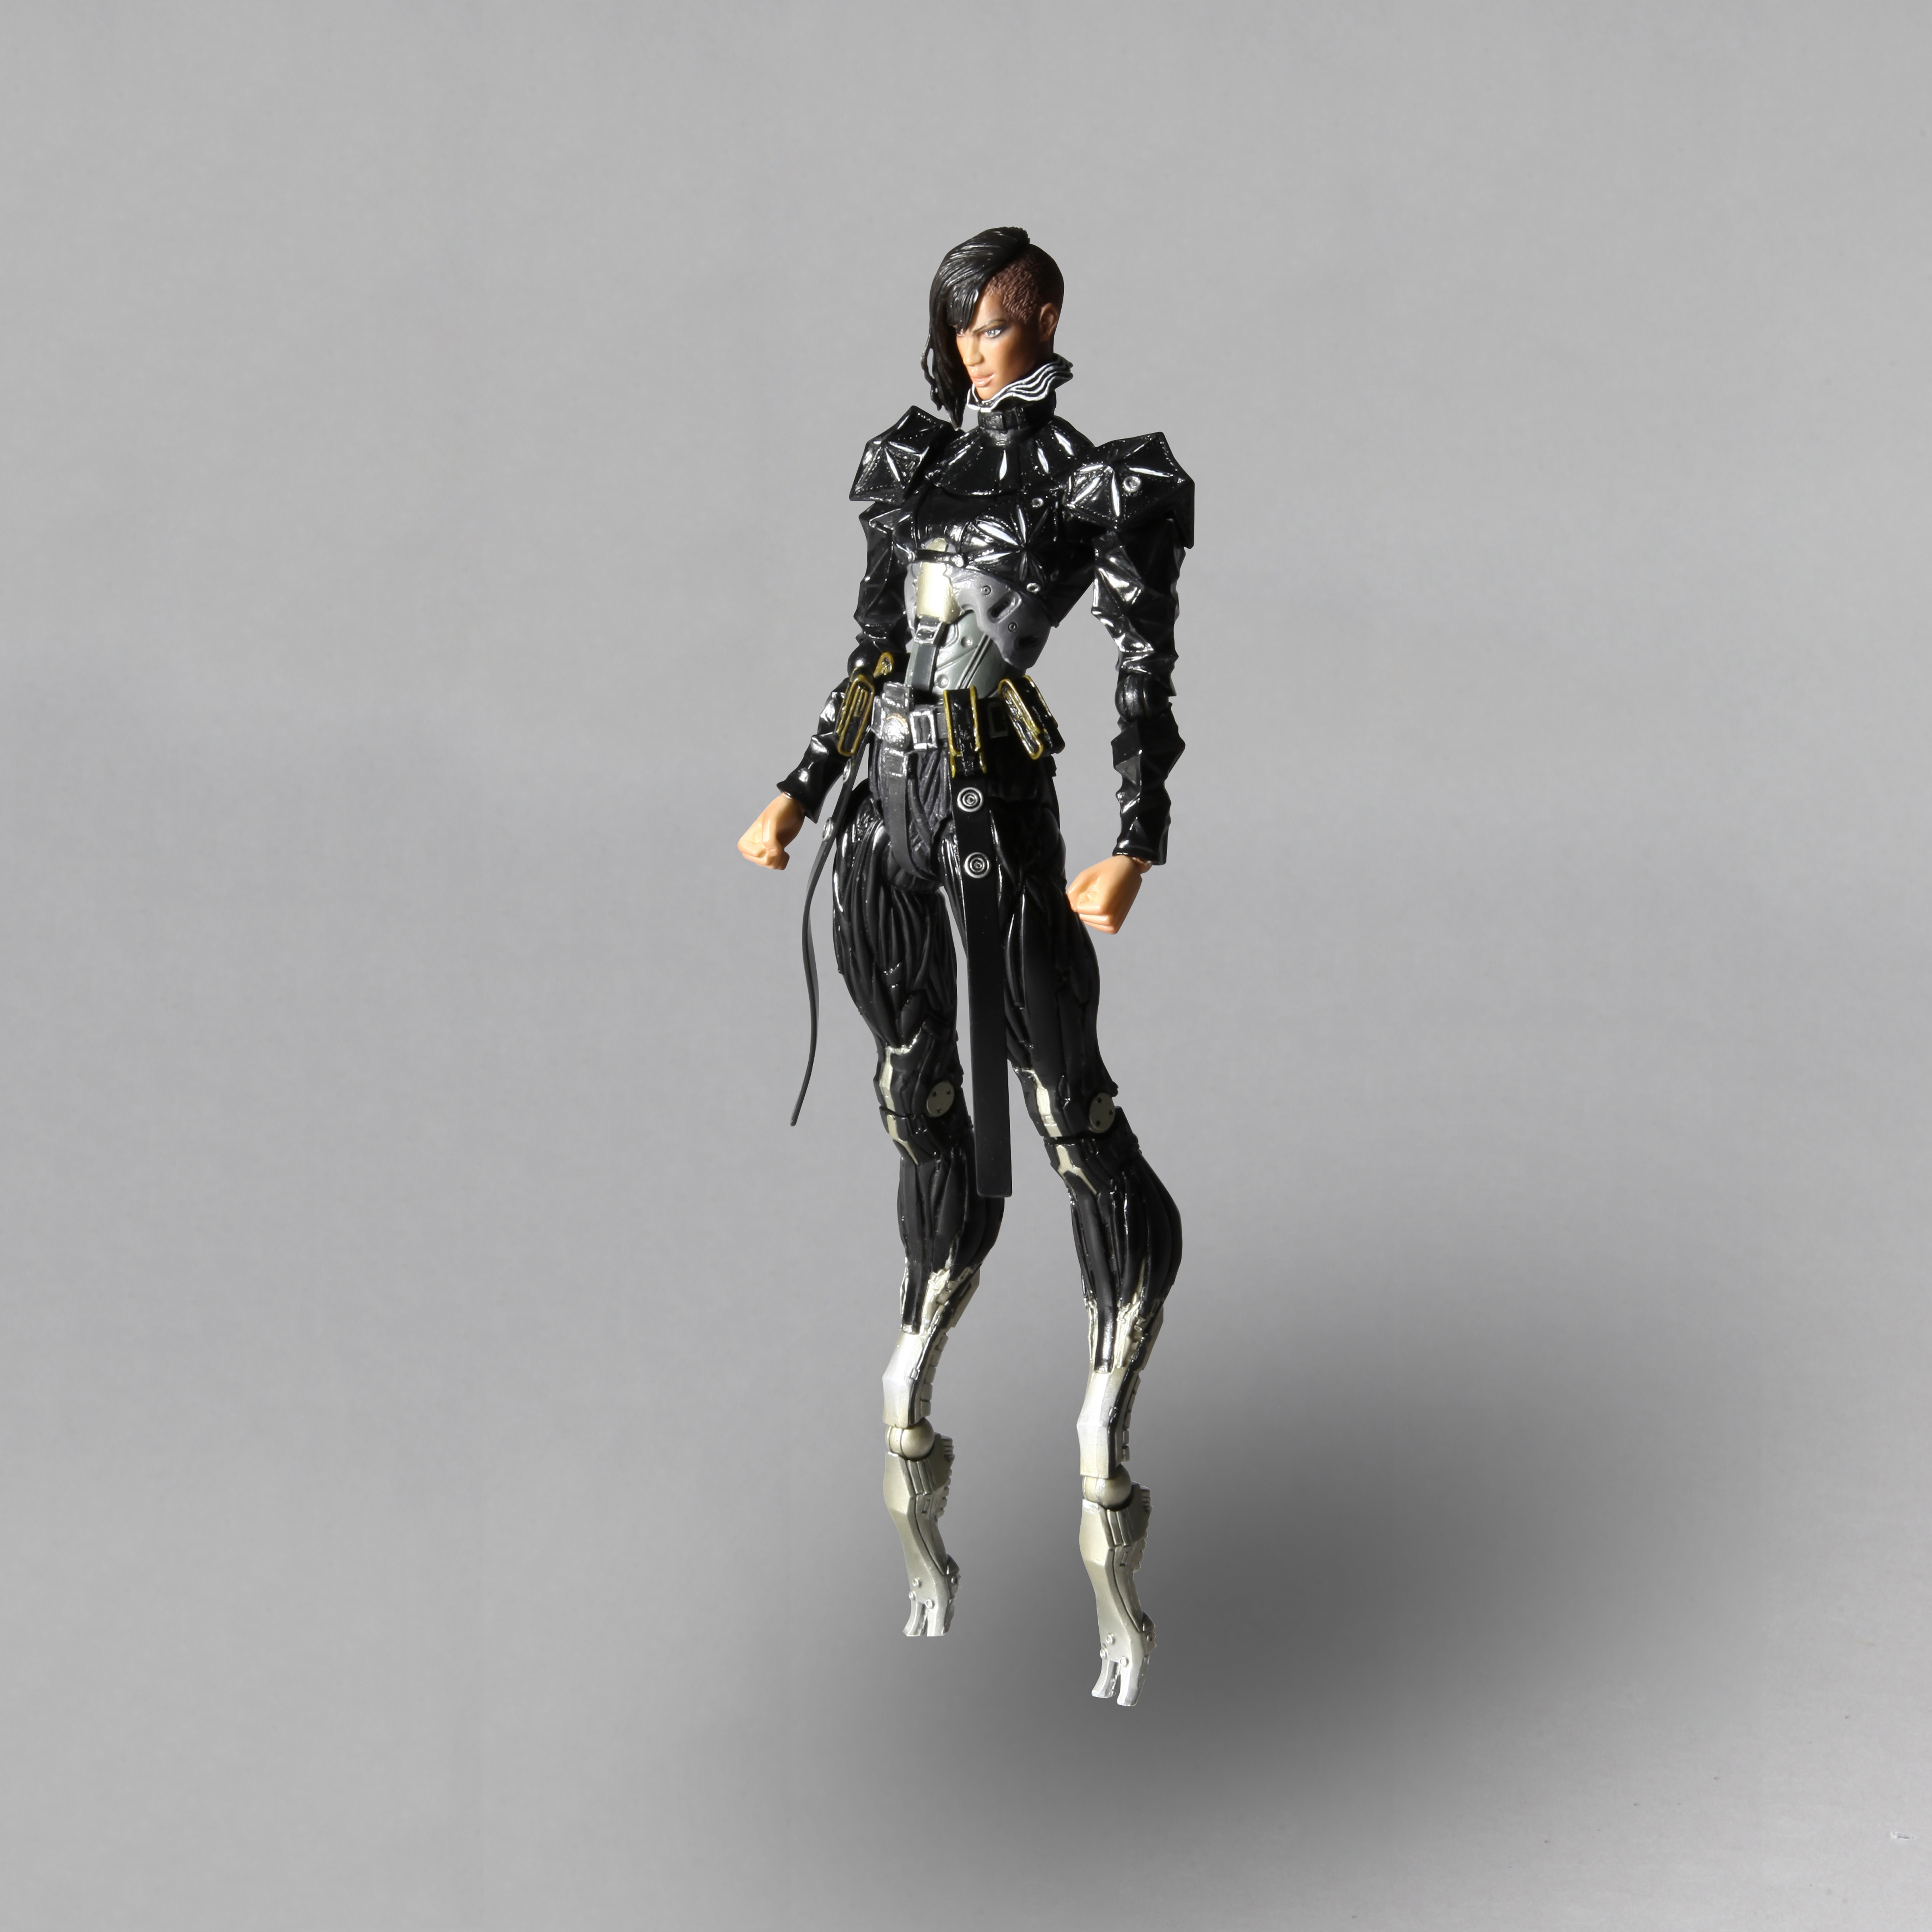 Capture d'écran du jeu DEUS EX: HUMAN REVOLUTION Play Arts Kai [Yelena Fedorova]